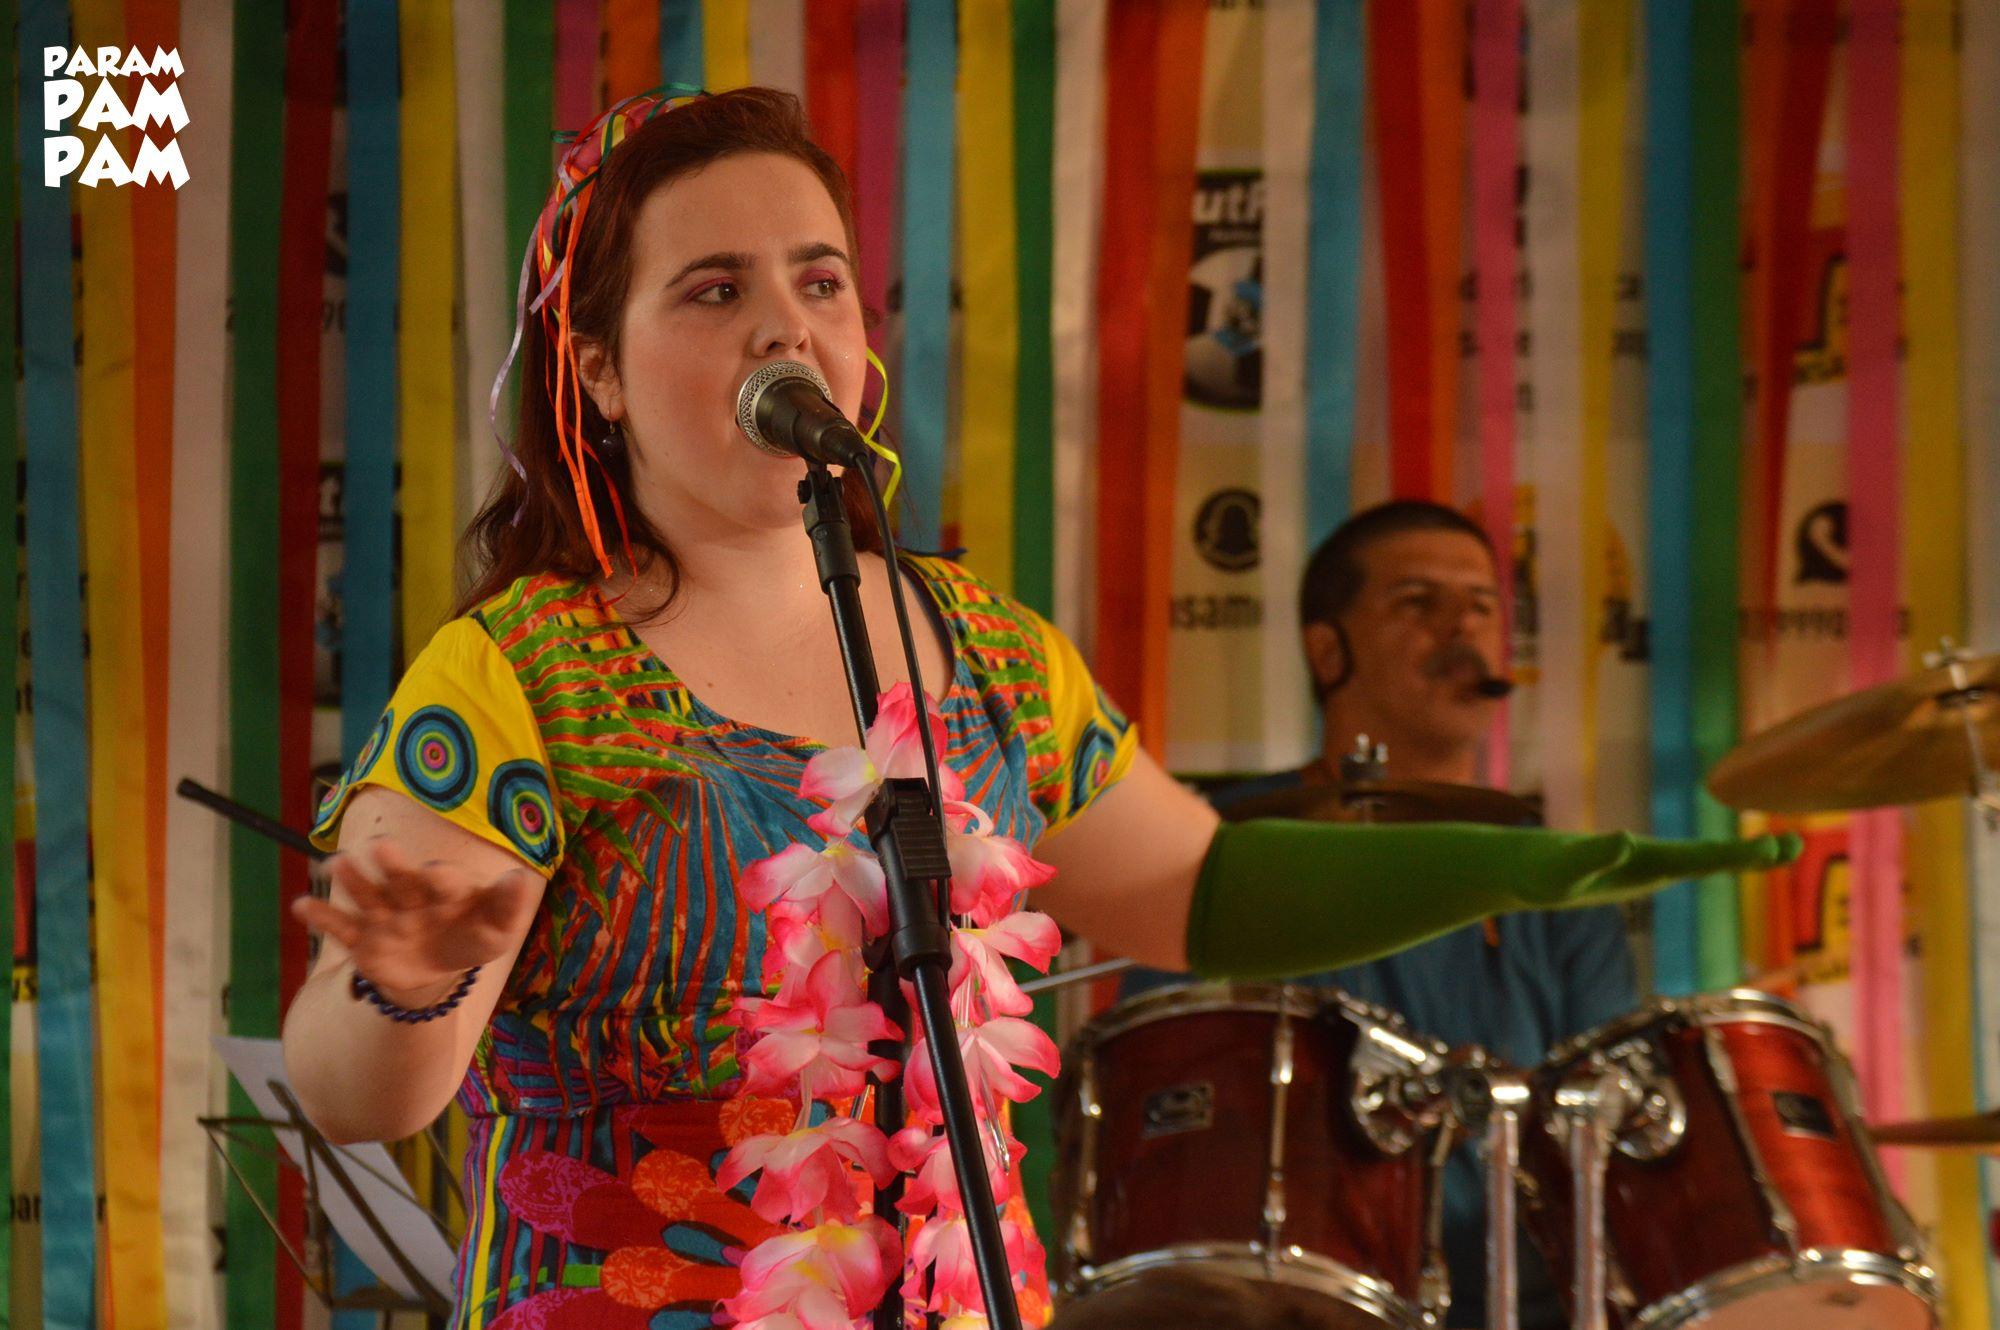 carnaval pppam_06